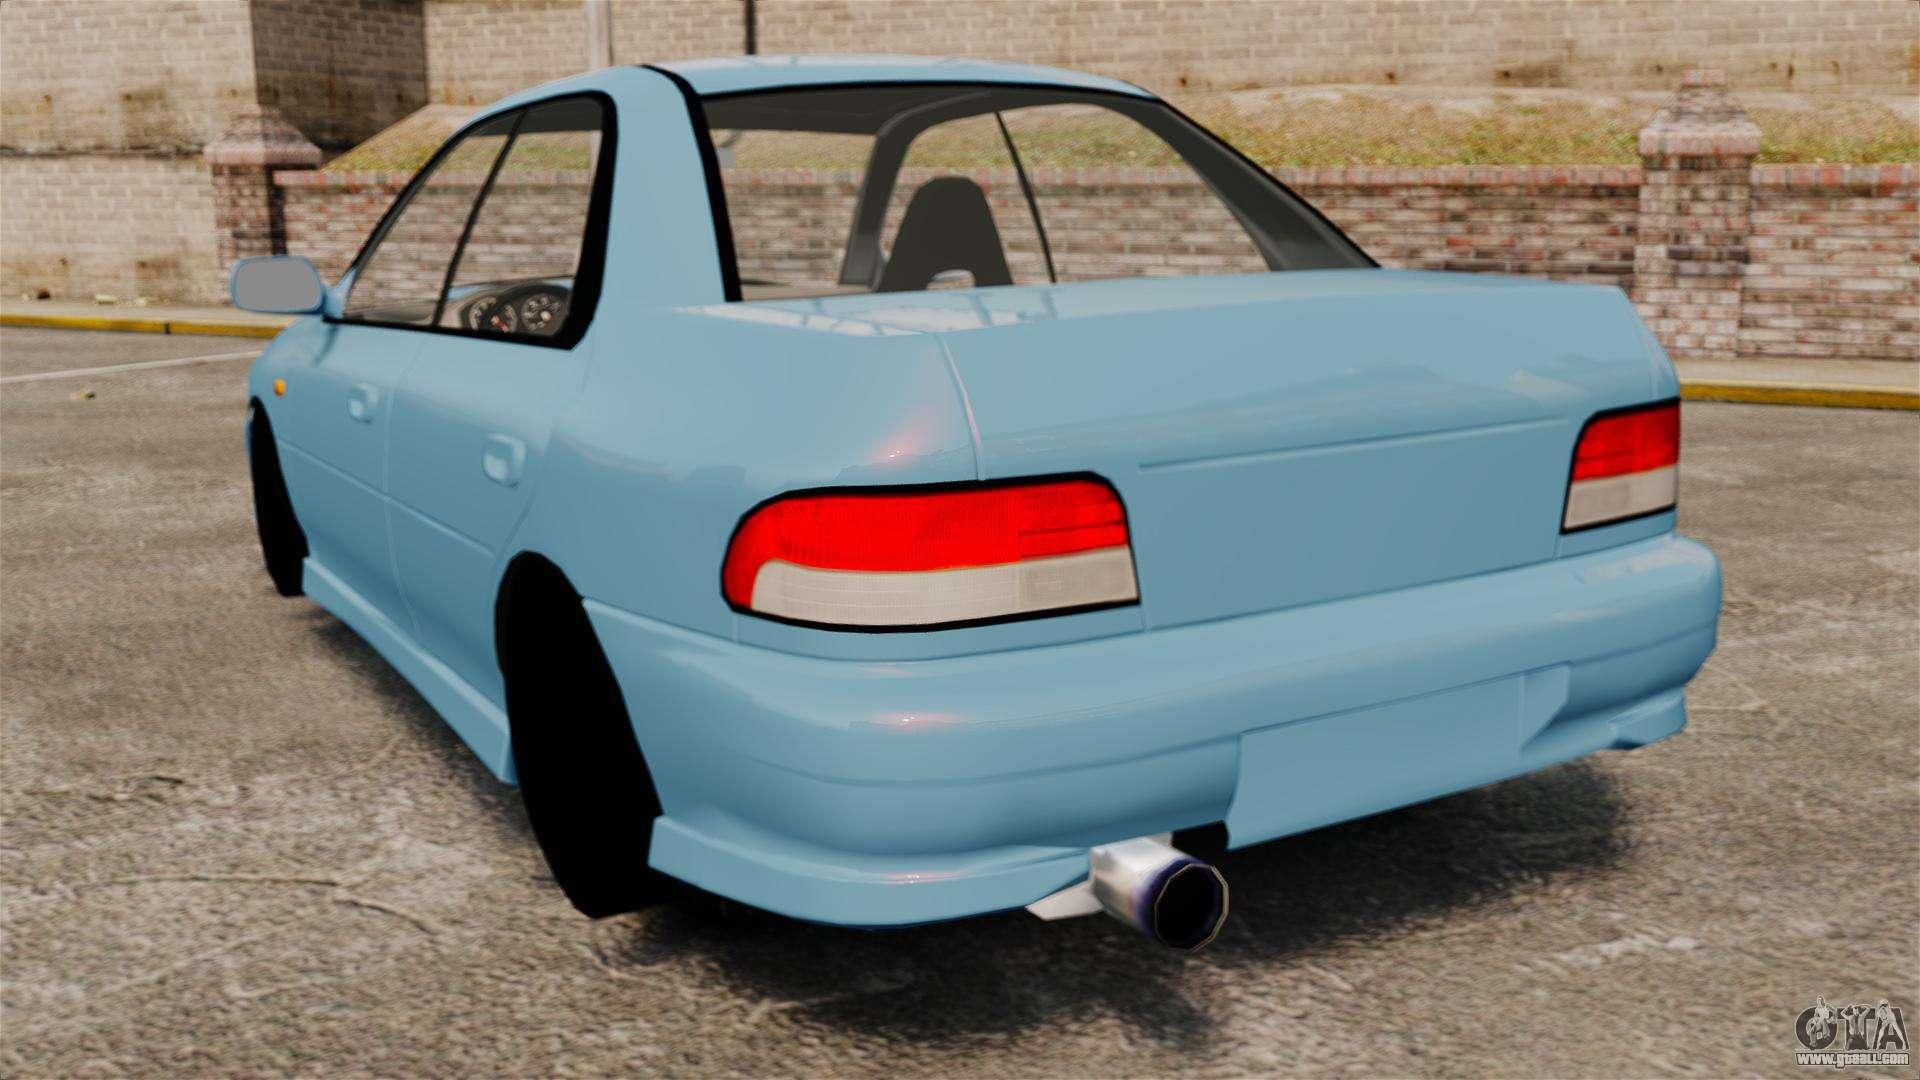 Wrx Sti 0 60 >> Subaru Impreza WRX STI 5 Domestic Drifter 1999 for GTA 4